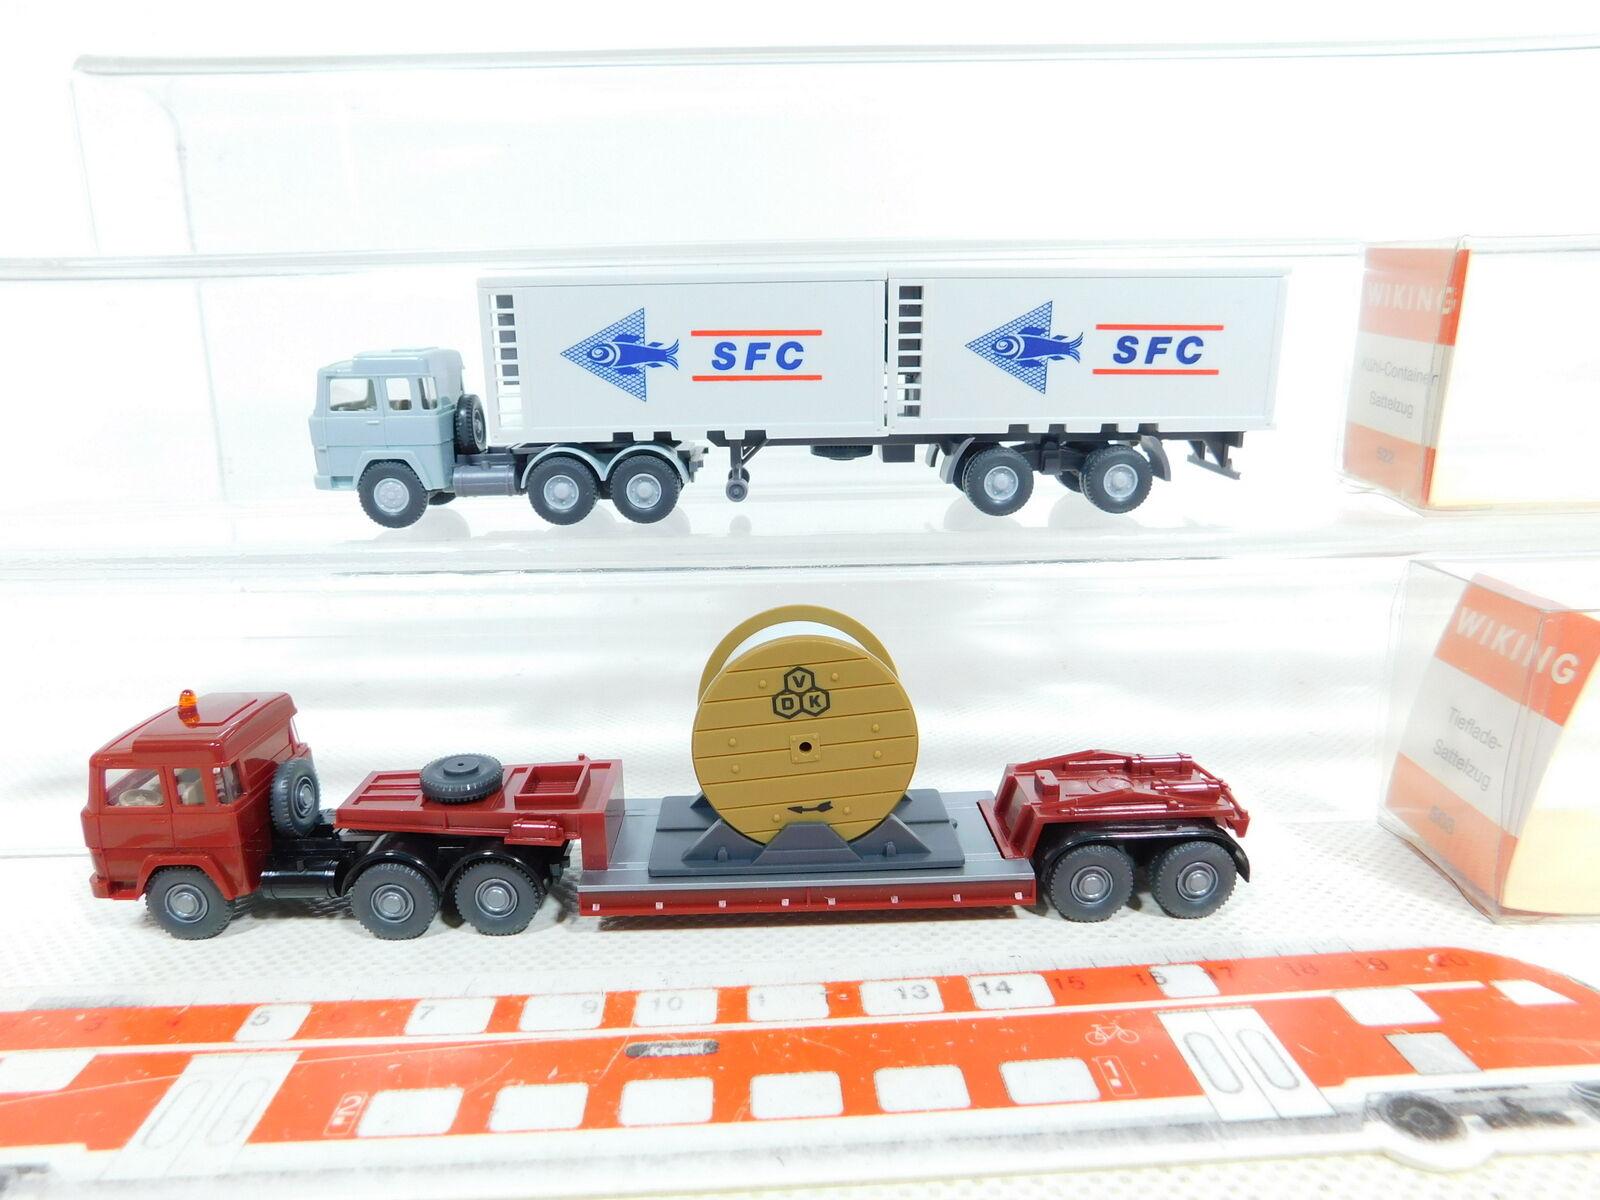 BX316-0, 5 x Wiking 1 87 H0 Lorry Magirus  503 Vdk +522 Sfc , Very Good +Box